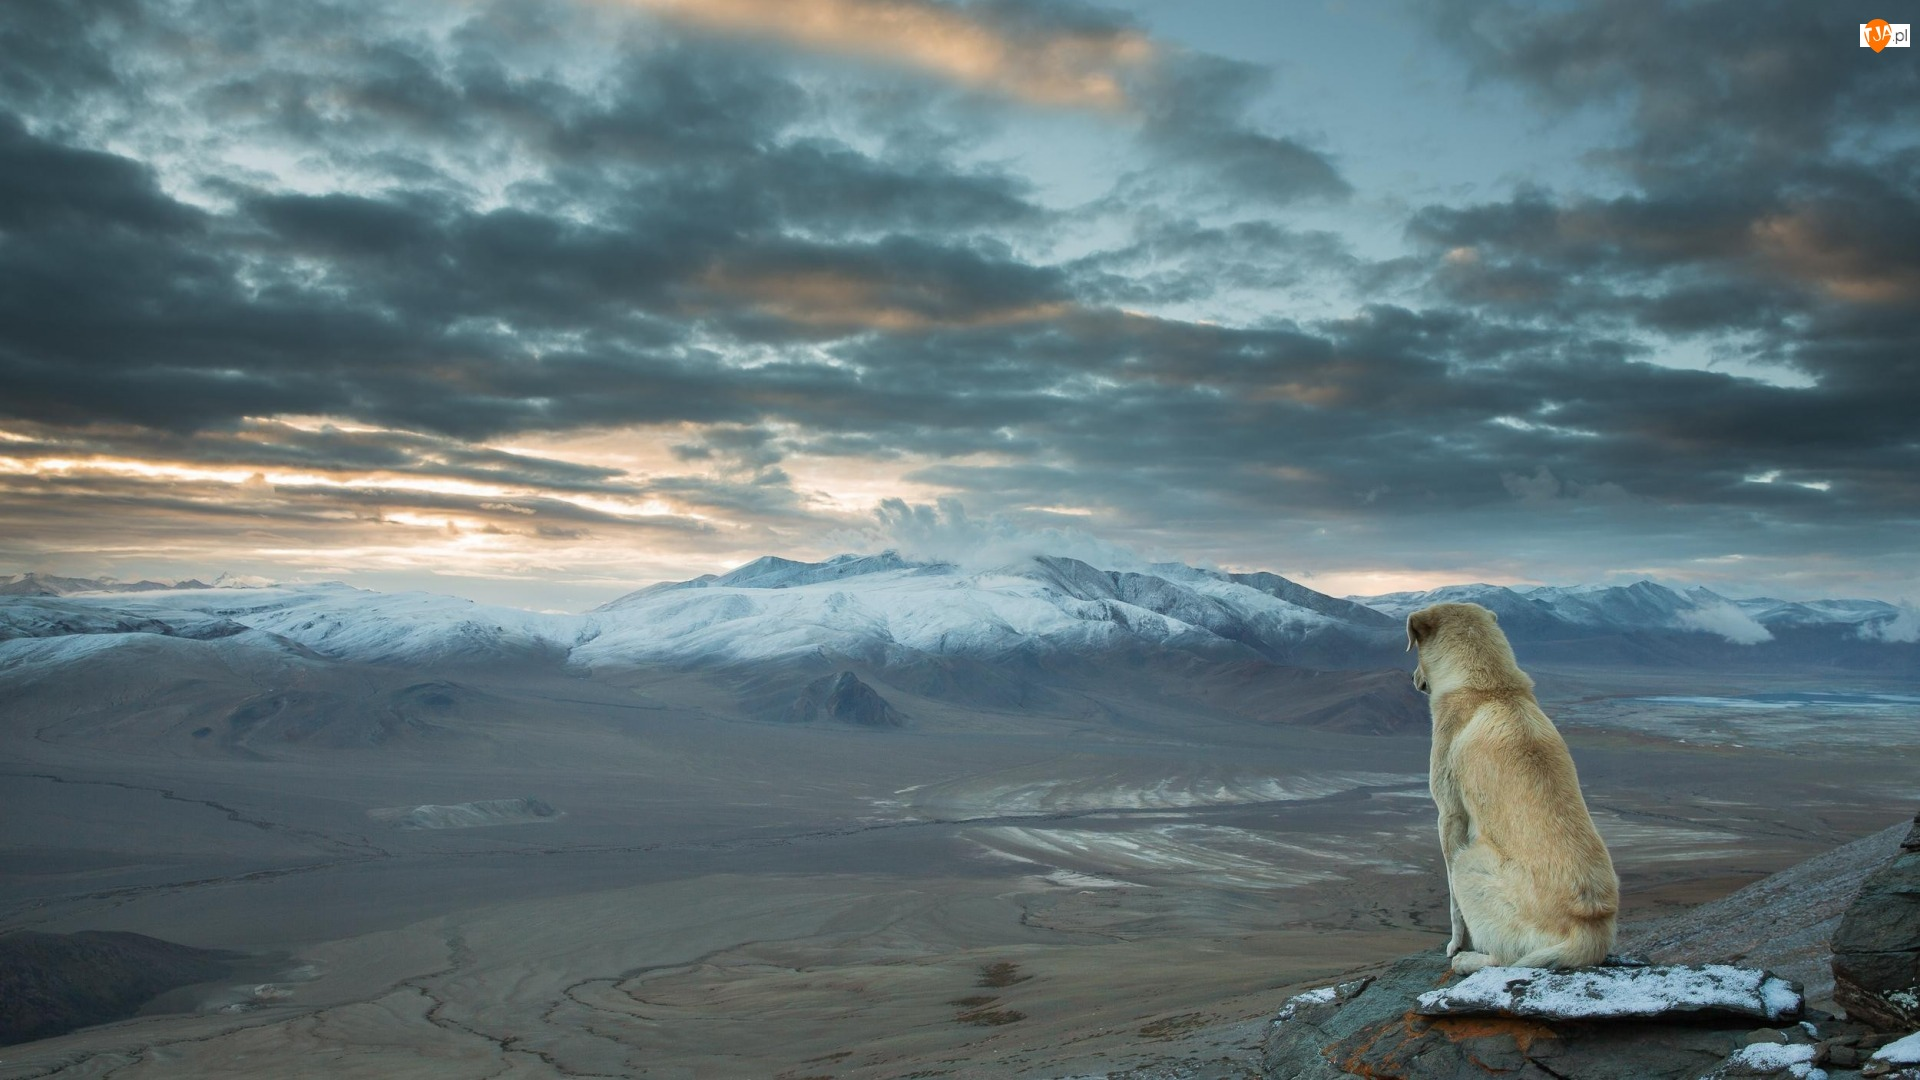 Pies, Indie, Góry Himalaje, Chmury, Dolina